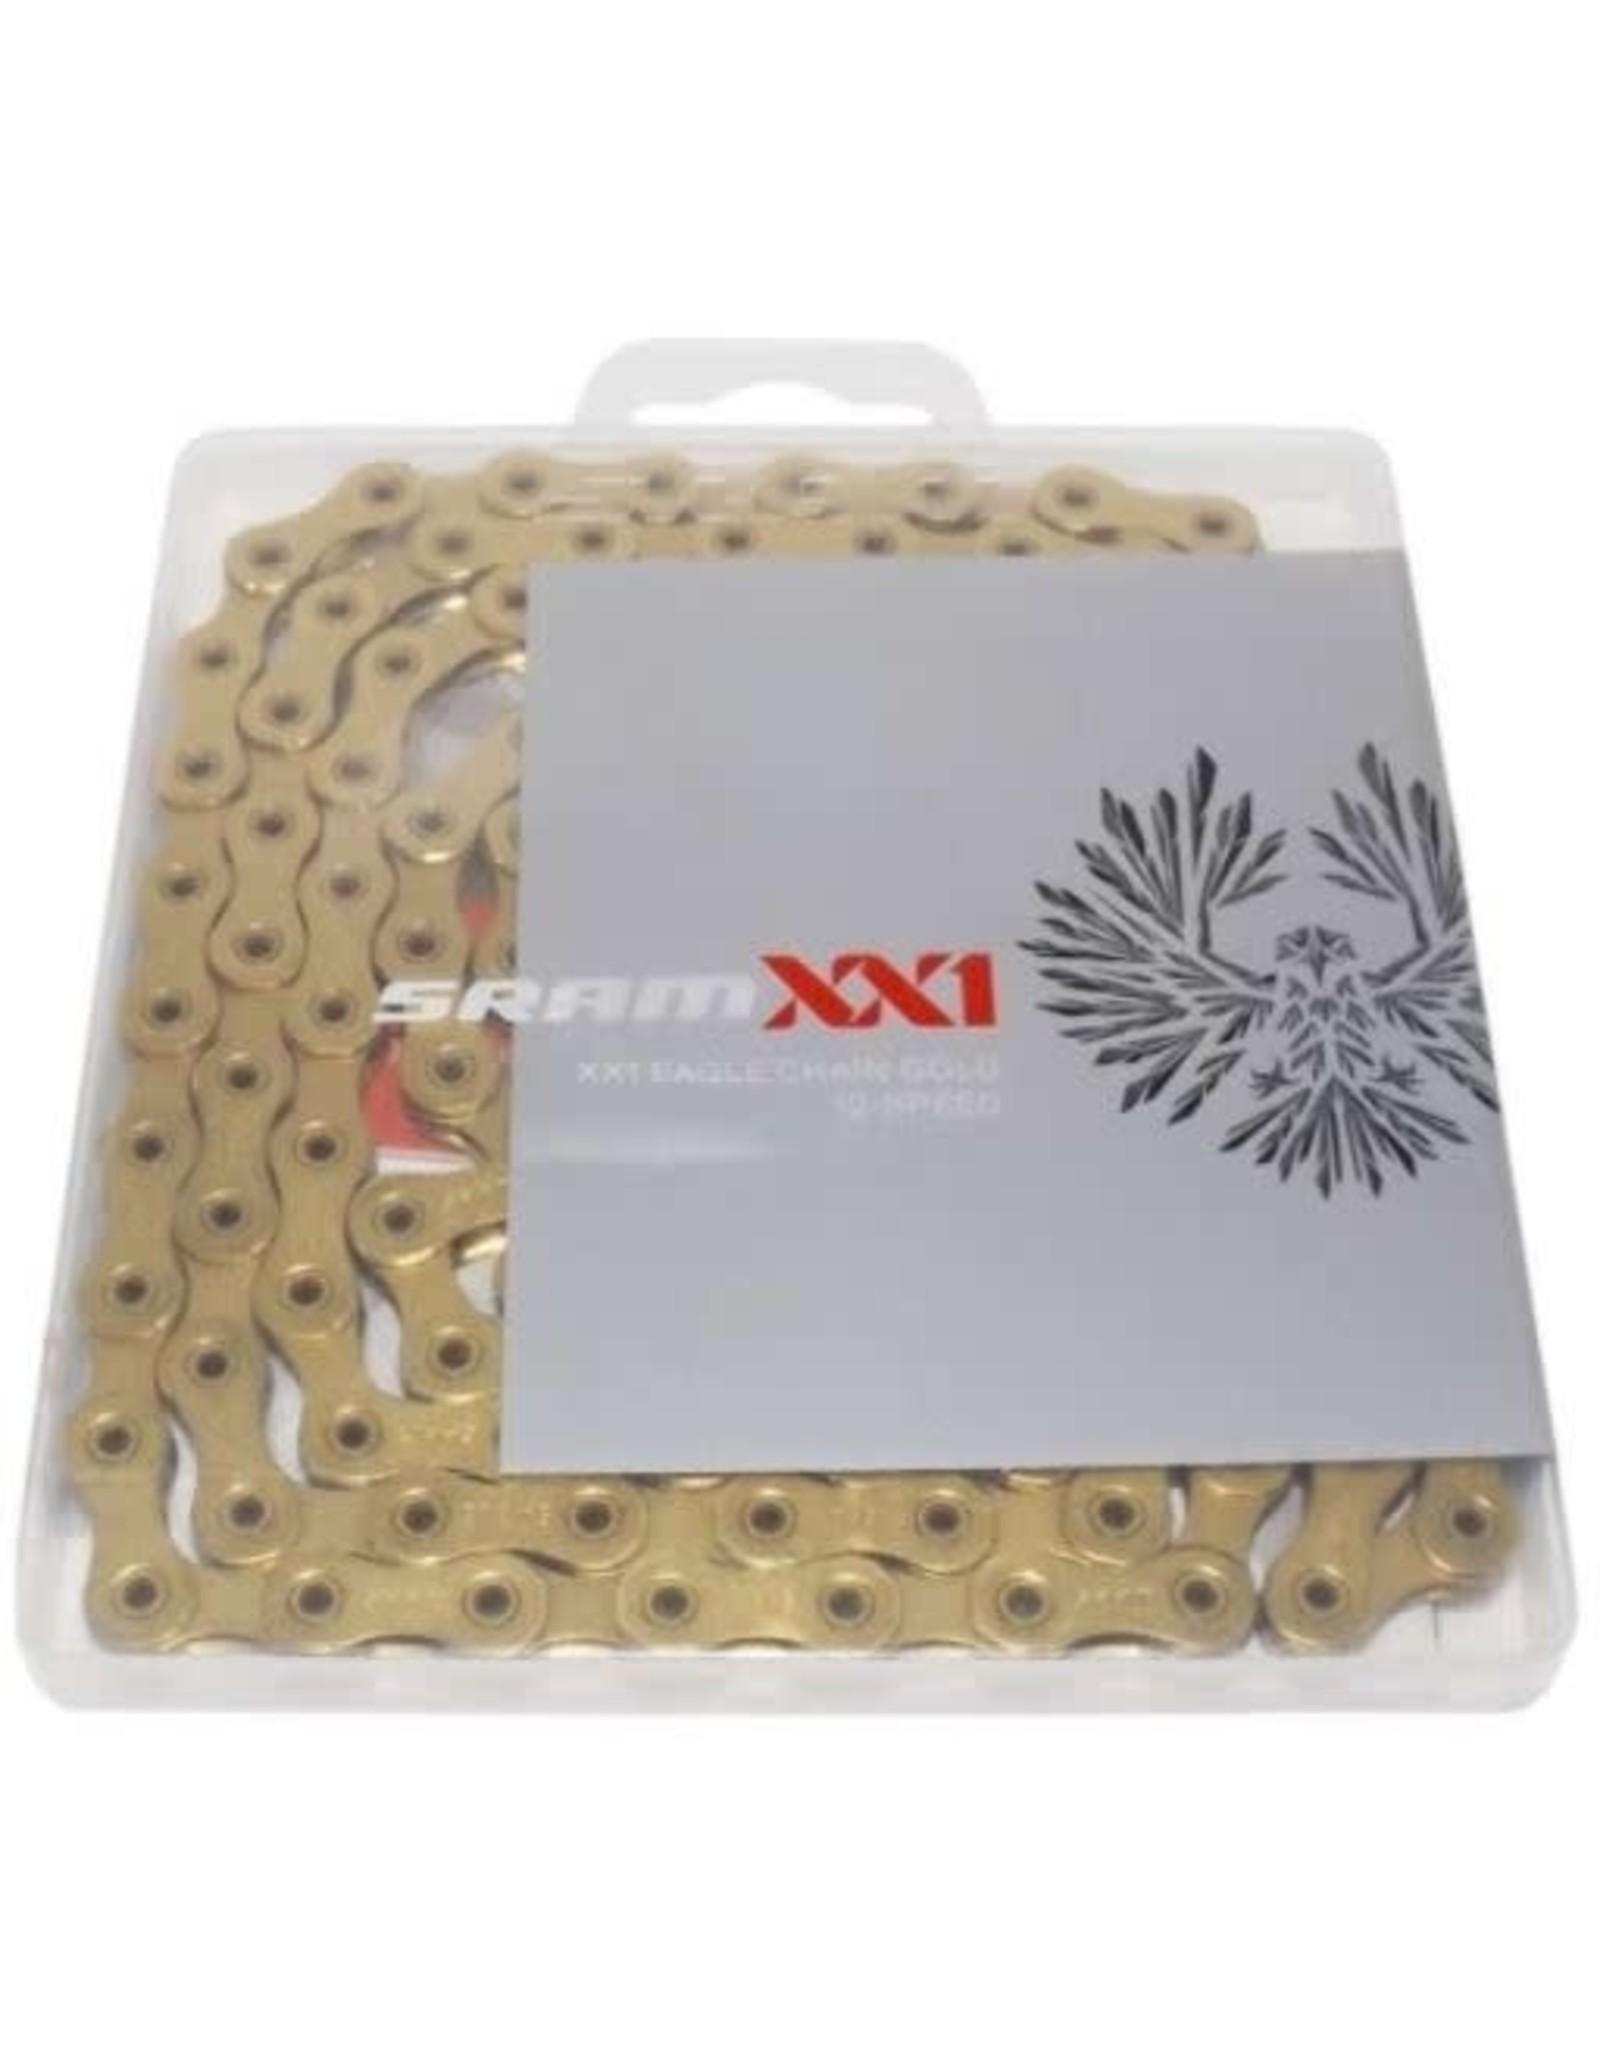 SRAM Chain SRAM PC-XX1 Eagle 12s 126 links gold